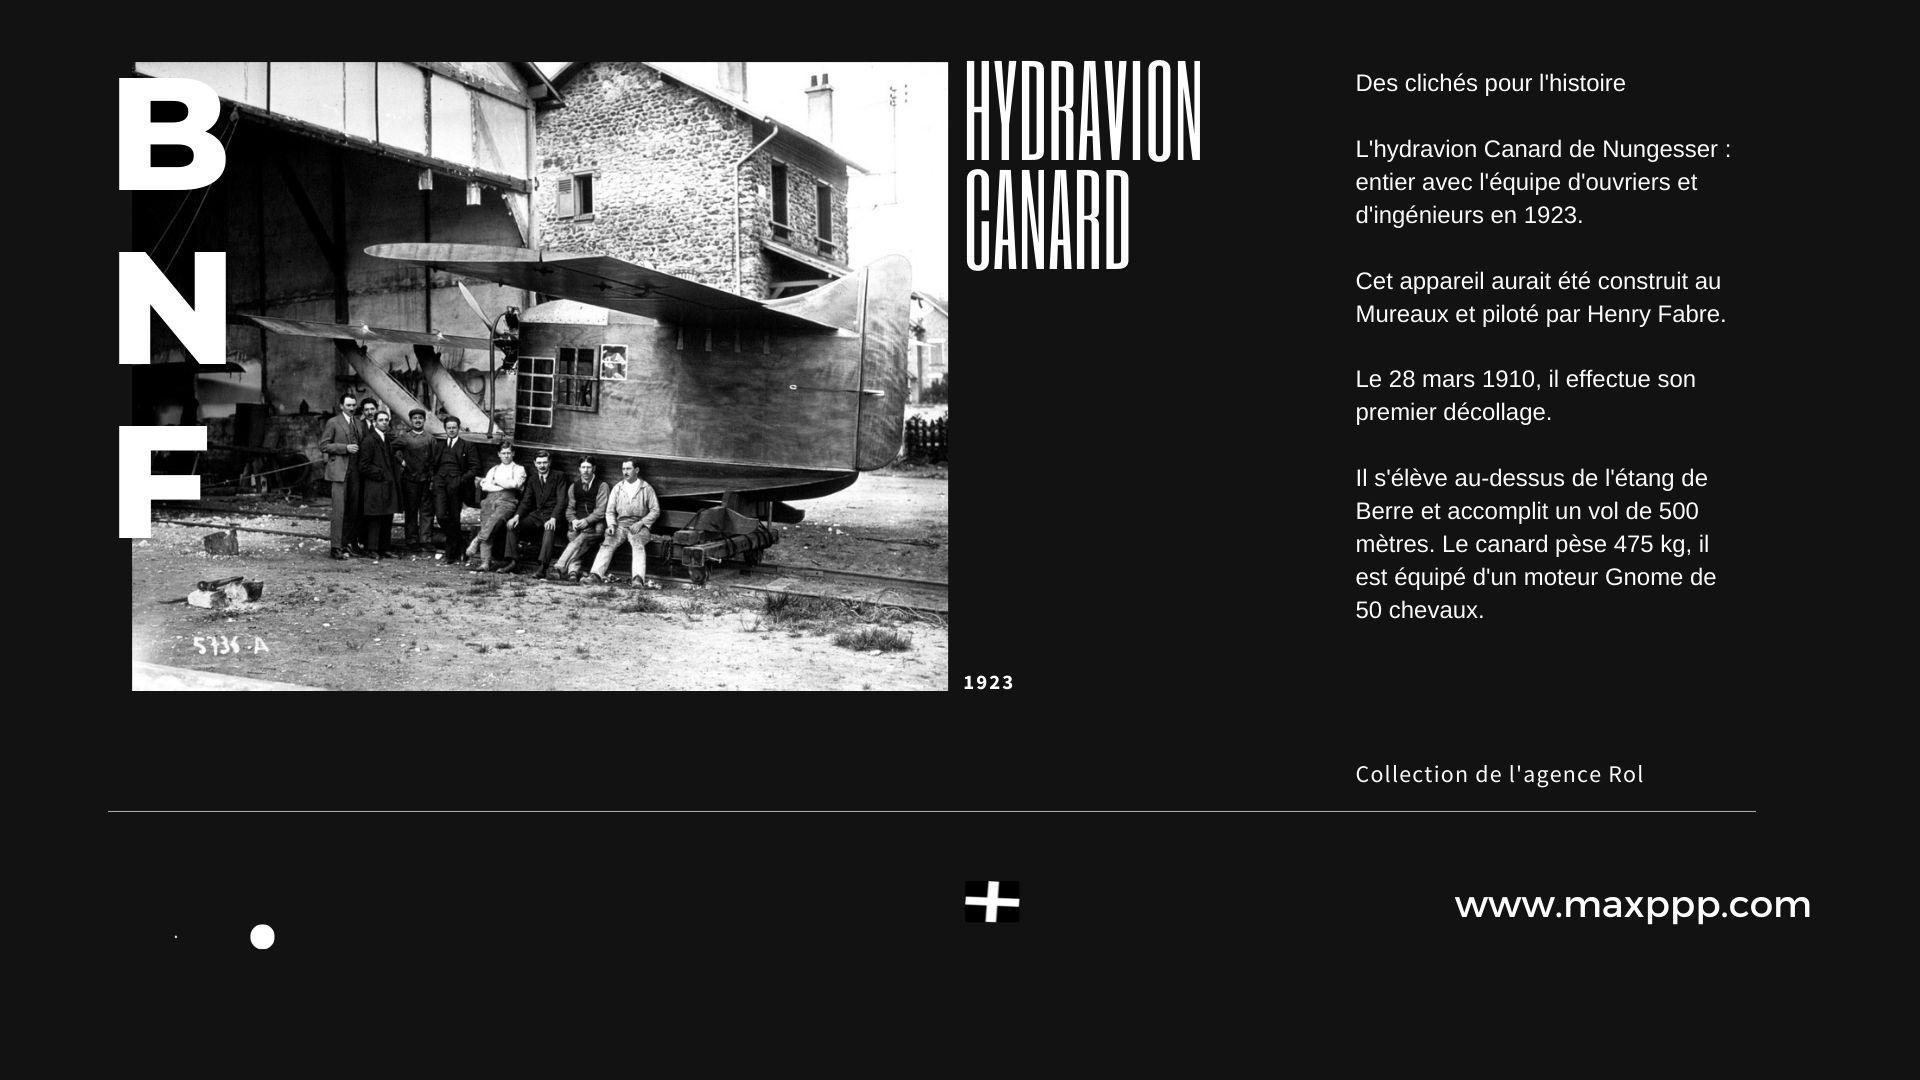 Hydravion canard